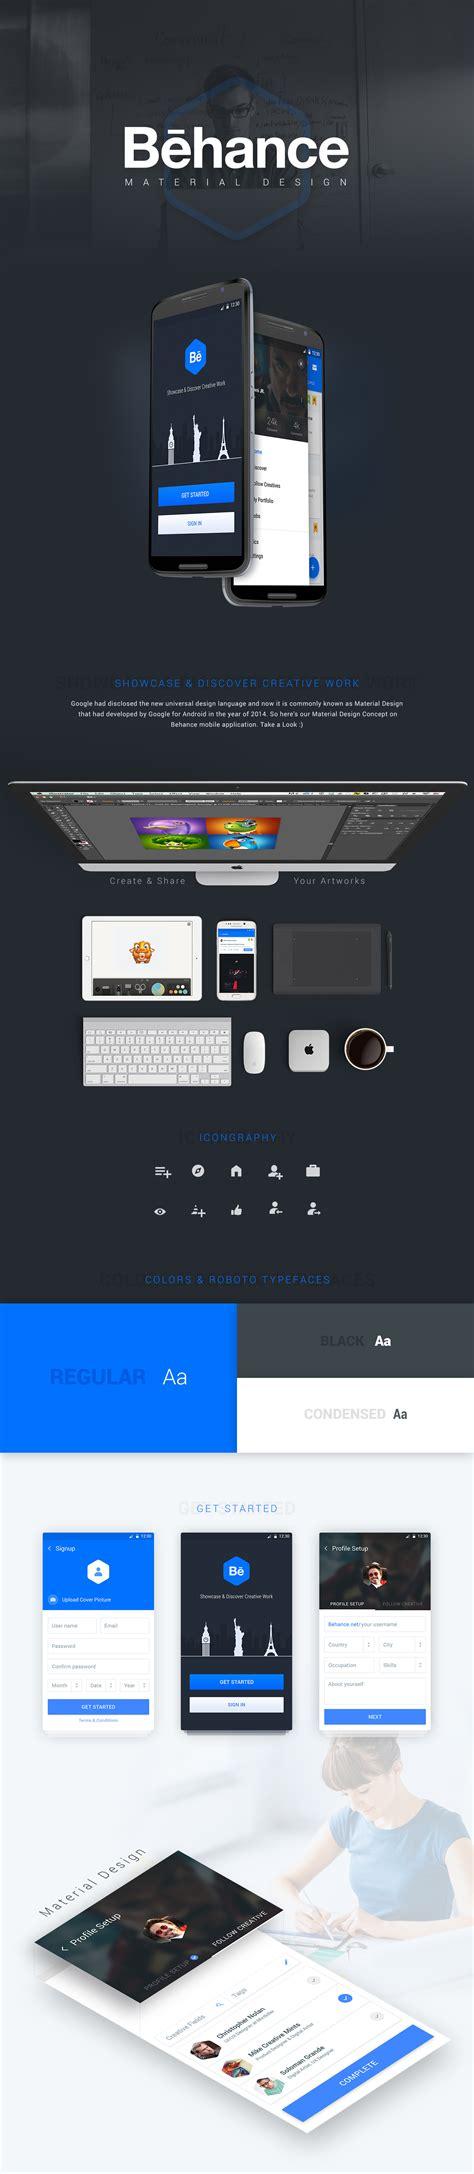 web layout behance behance material design on behance